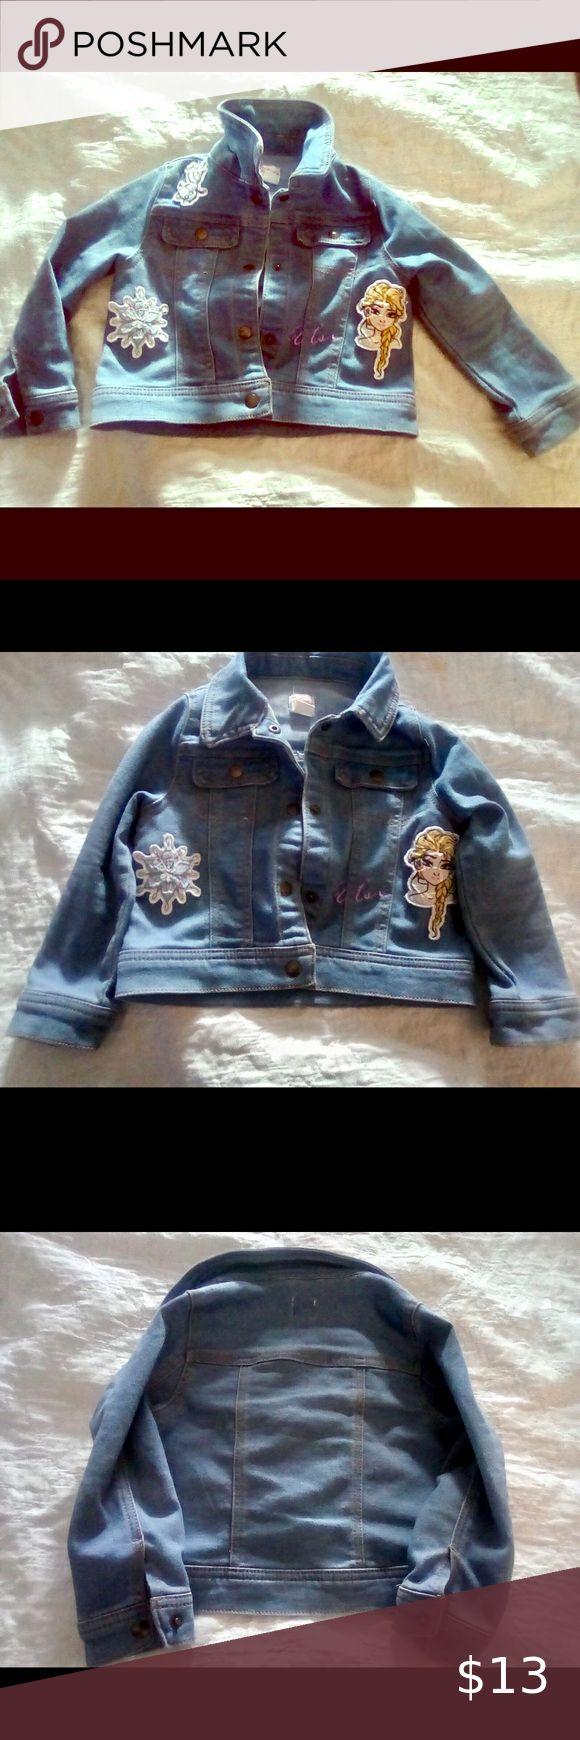 Disney Frozen Denim Jacket Toddler Girl 3t Toddler Girl Denim Jacket Disney Jacket [ 1740 x 580 Pixel ]